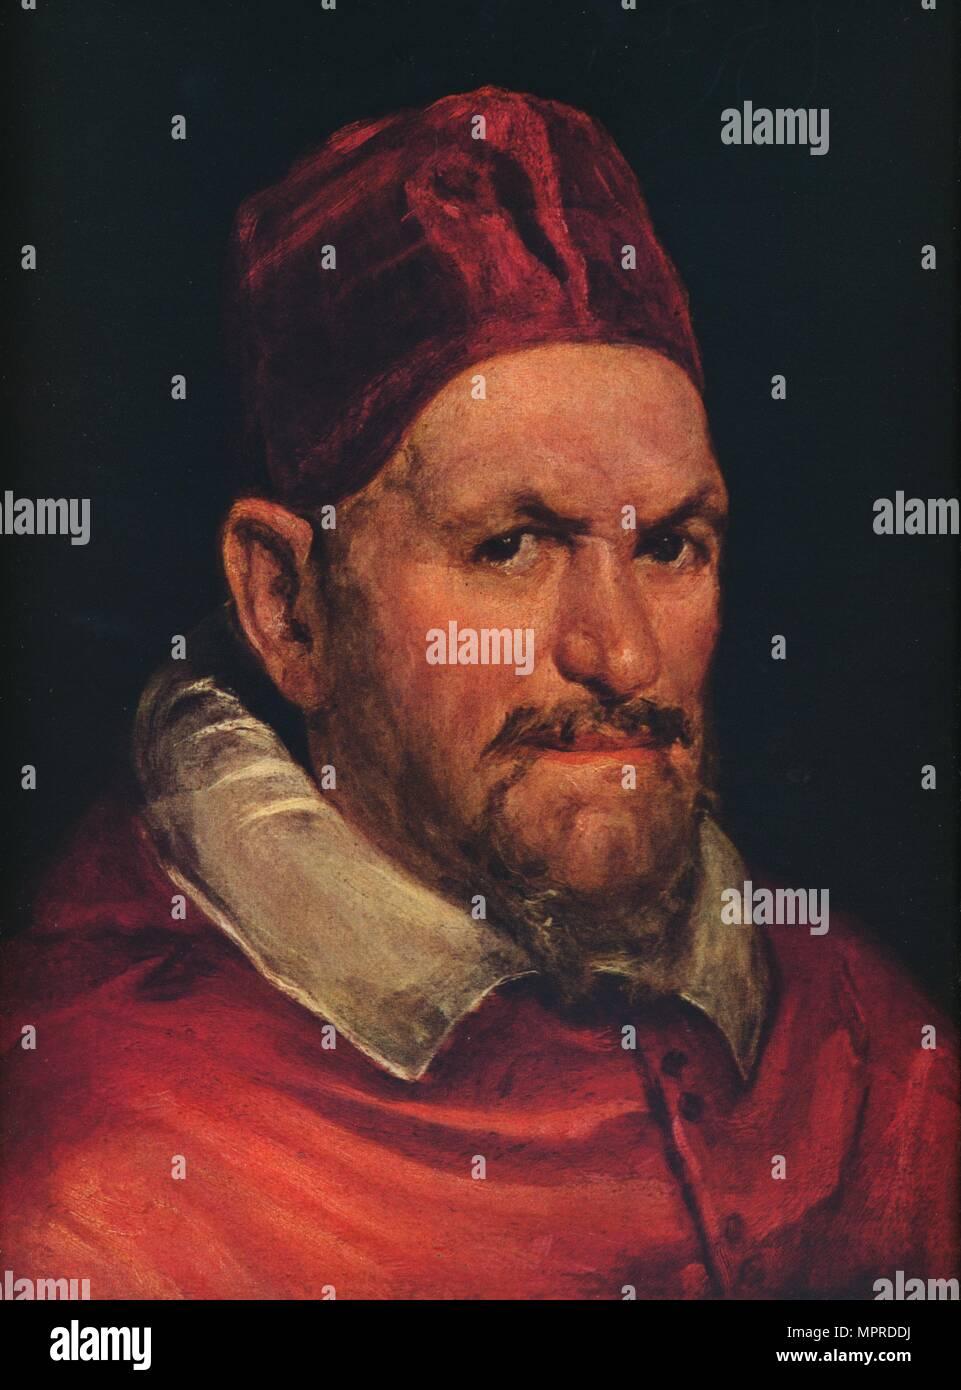 'Pope Innocent X', c1650. Artist: Diego Velazquez. - Stock Image